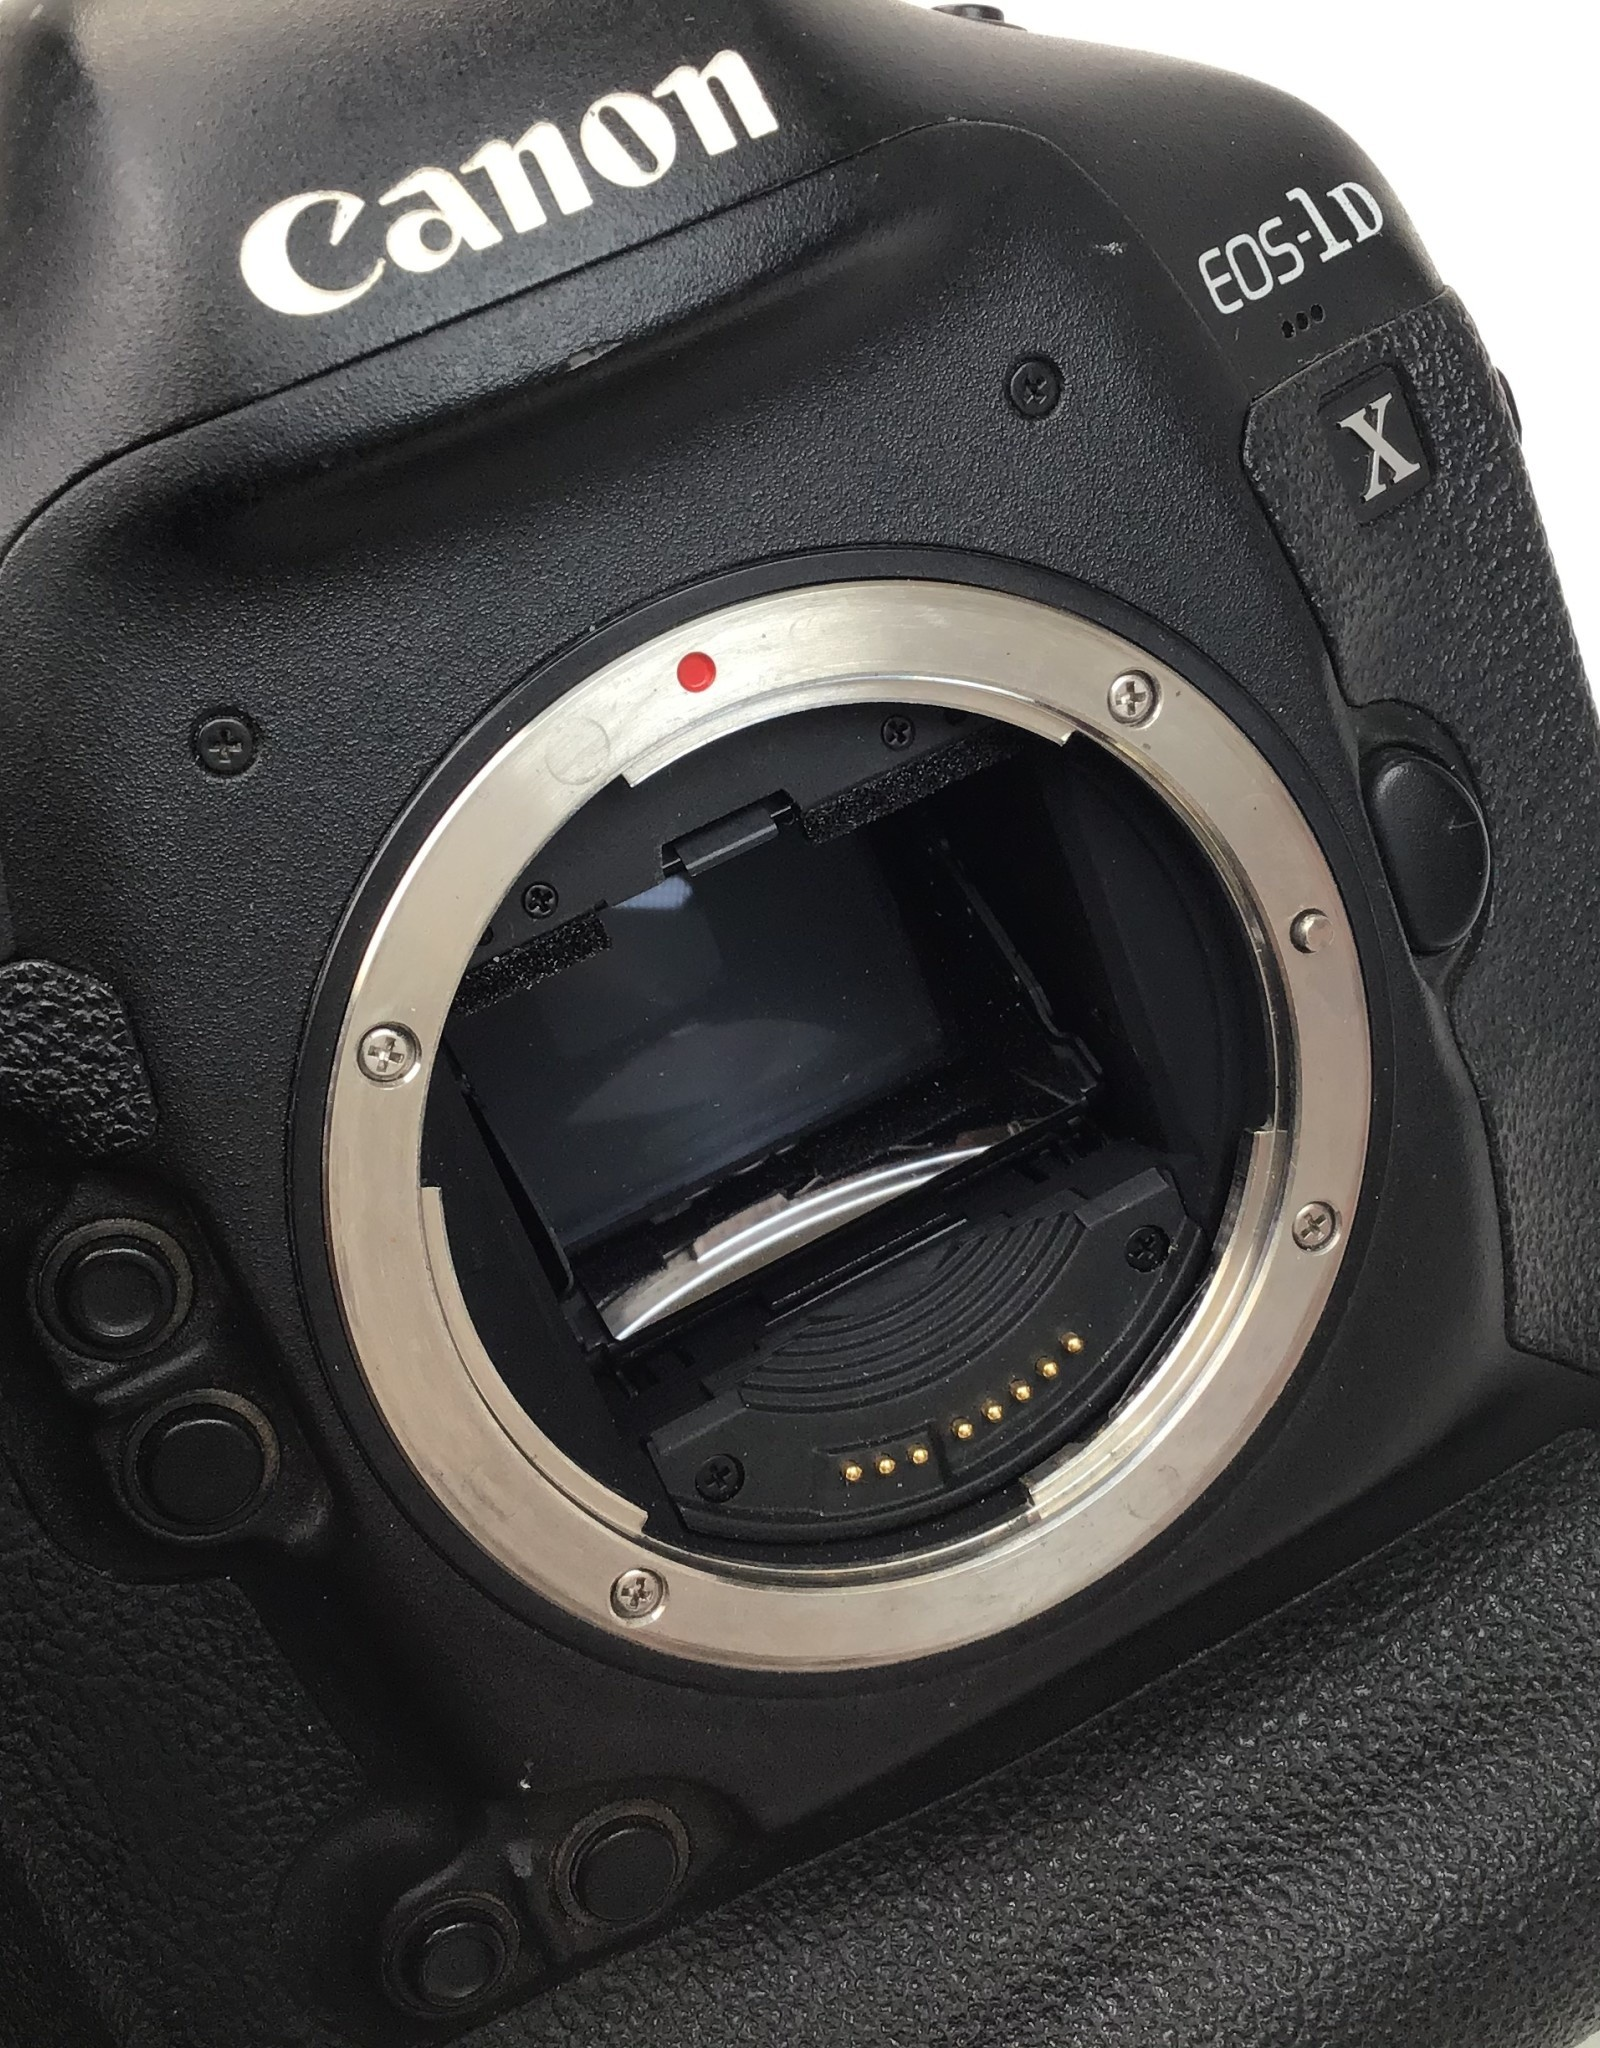 CANON Canon EOS 1DX Camera Body Shutter Count 492000 Used BGN